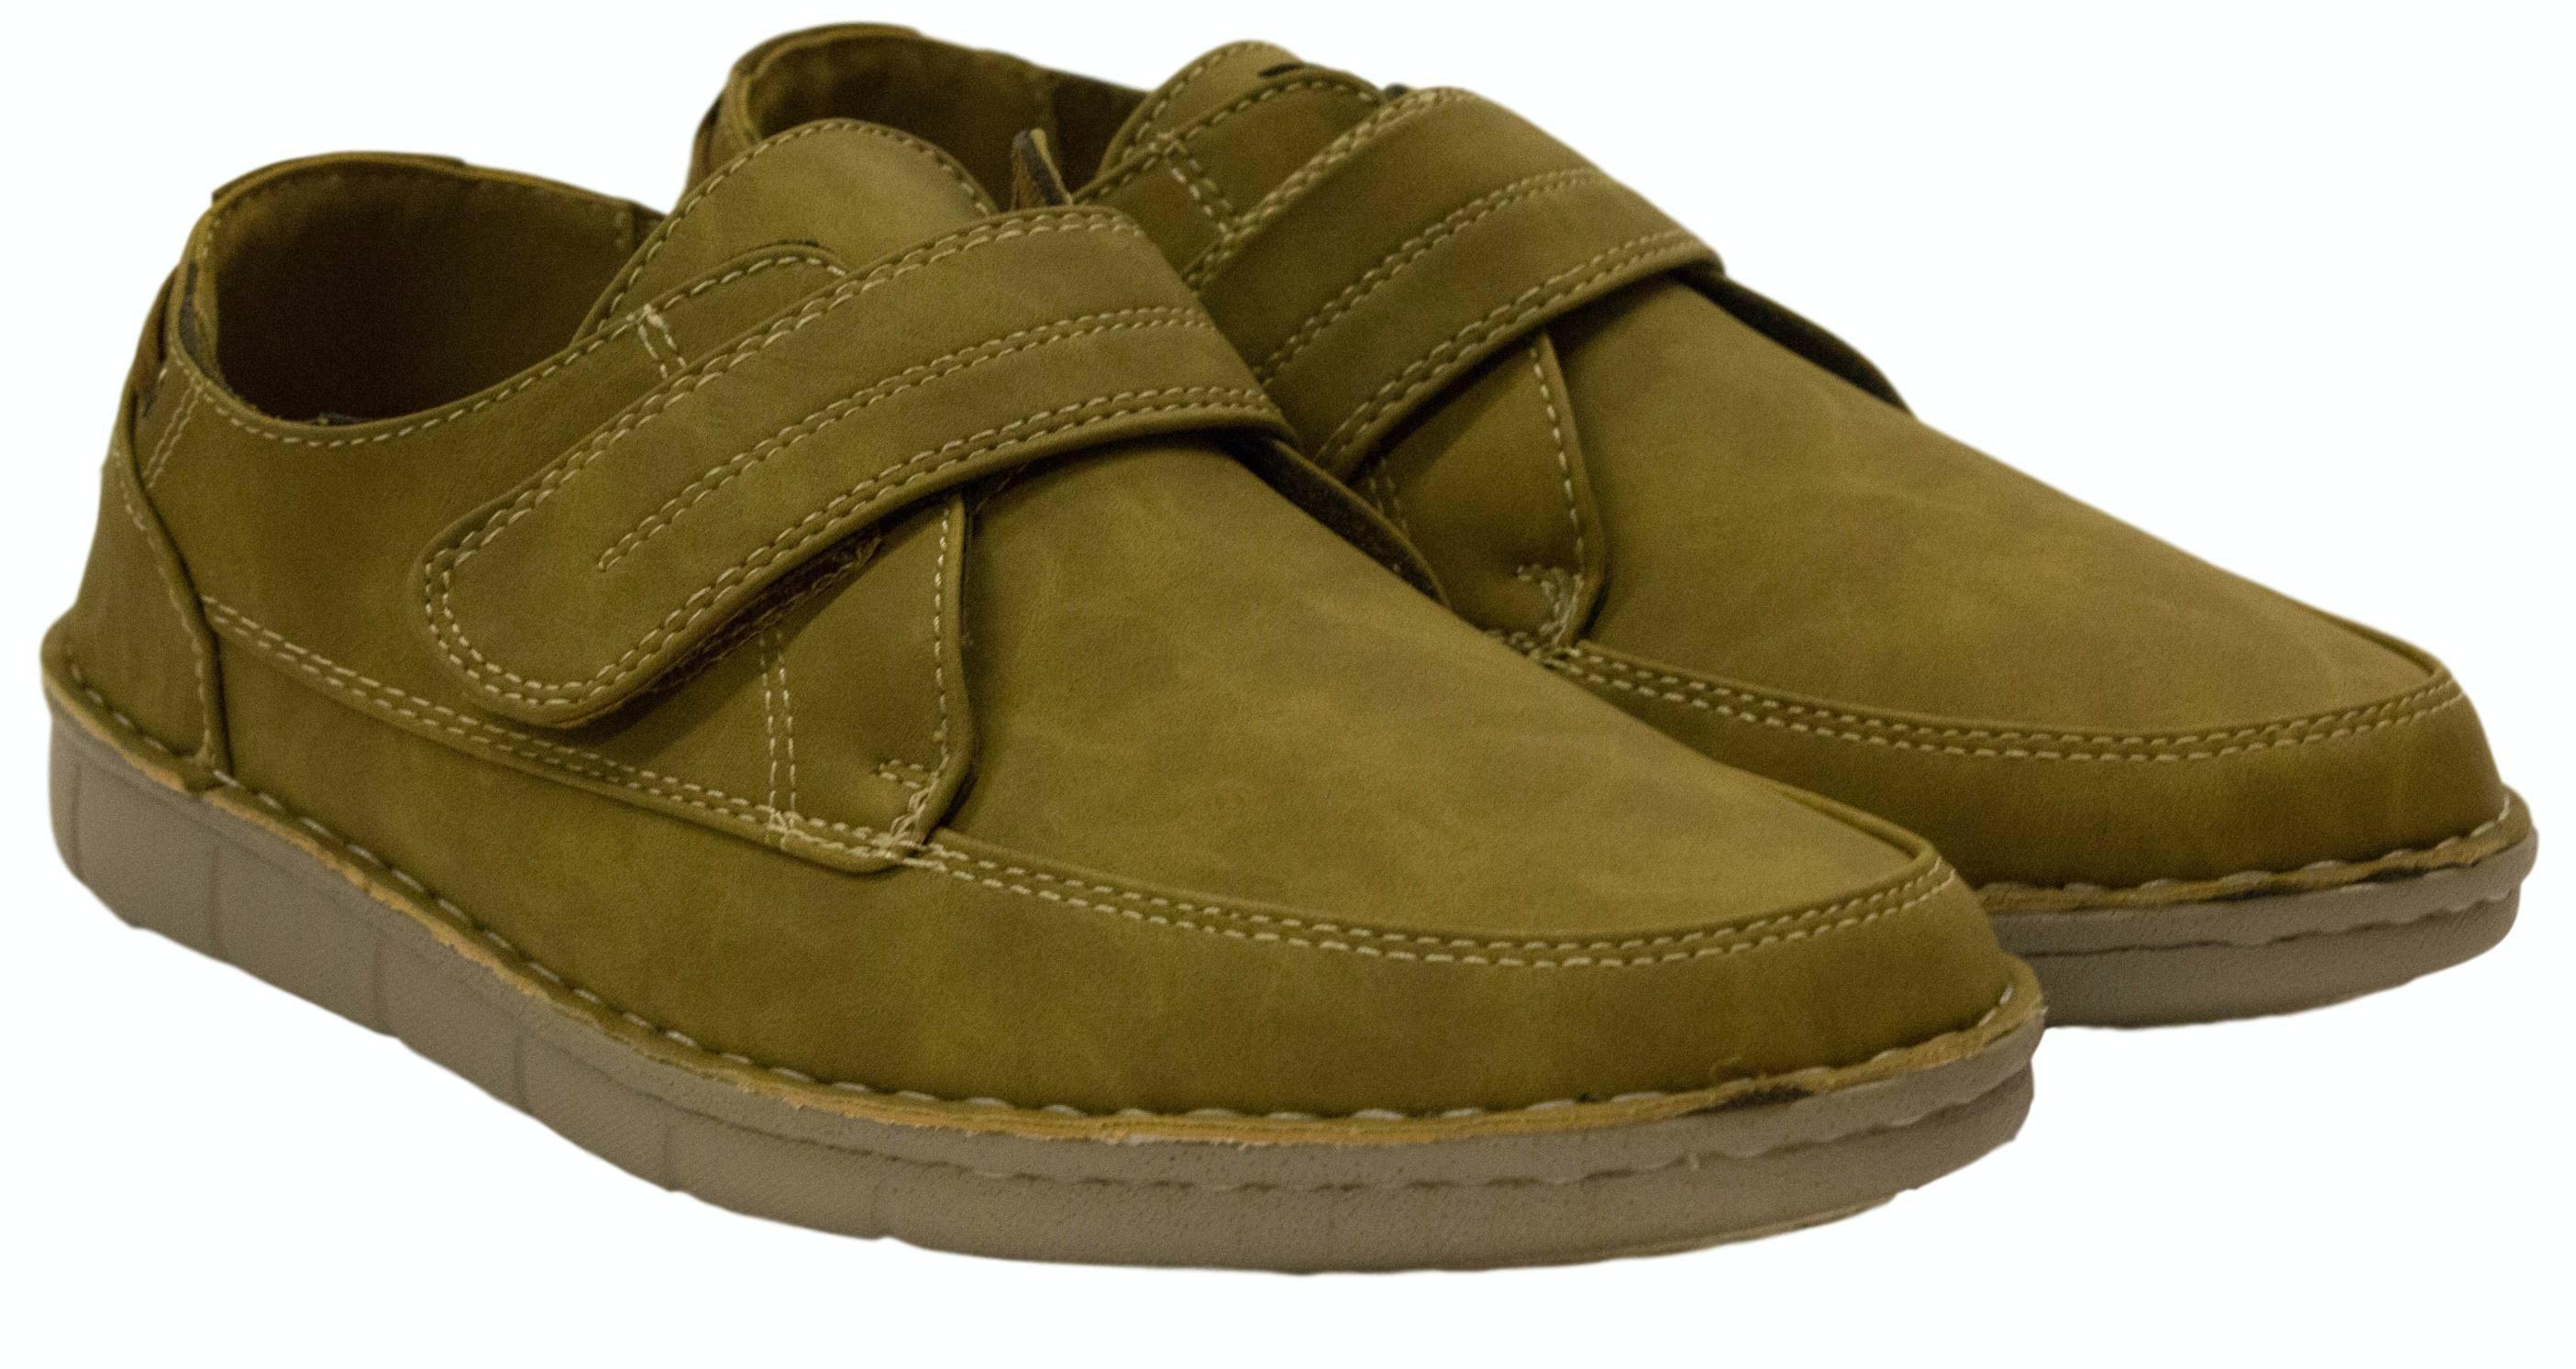 Dr Keller Robson Moccasin Velcro Shoe Tan